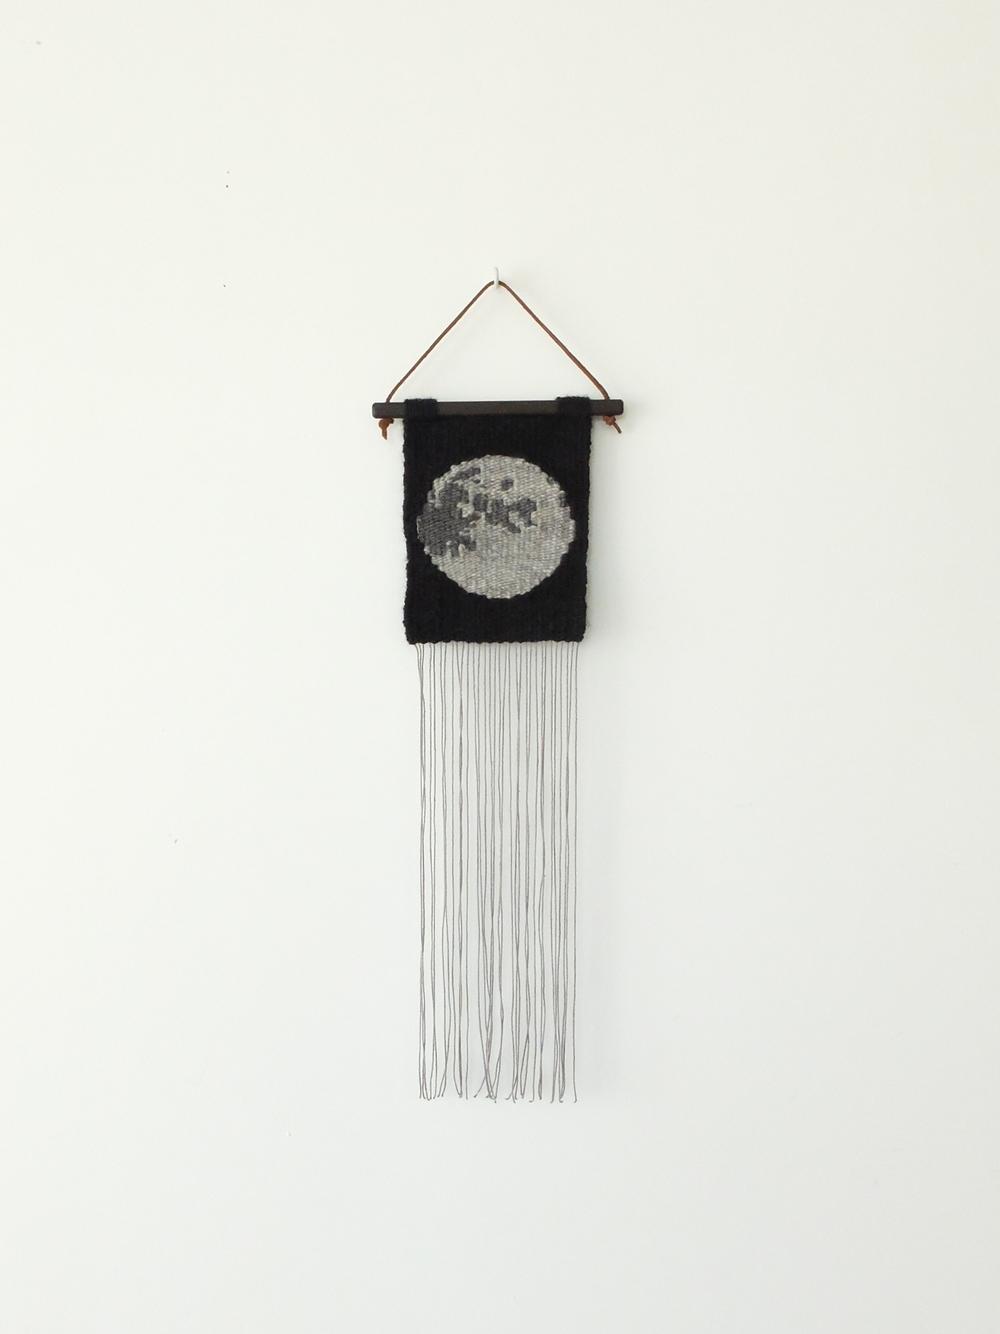 XVIII The Moon